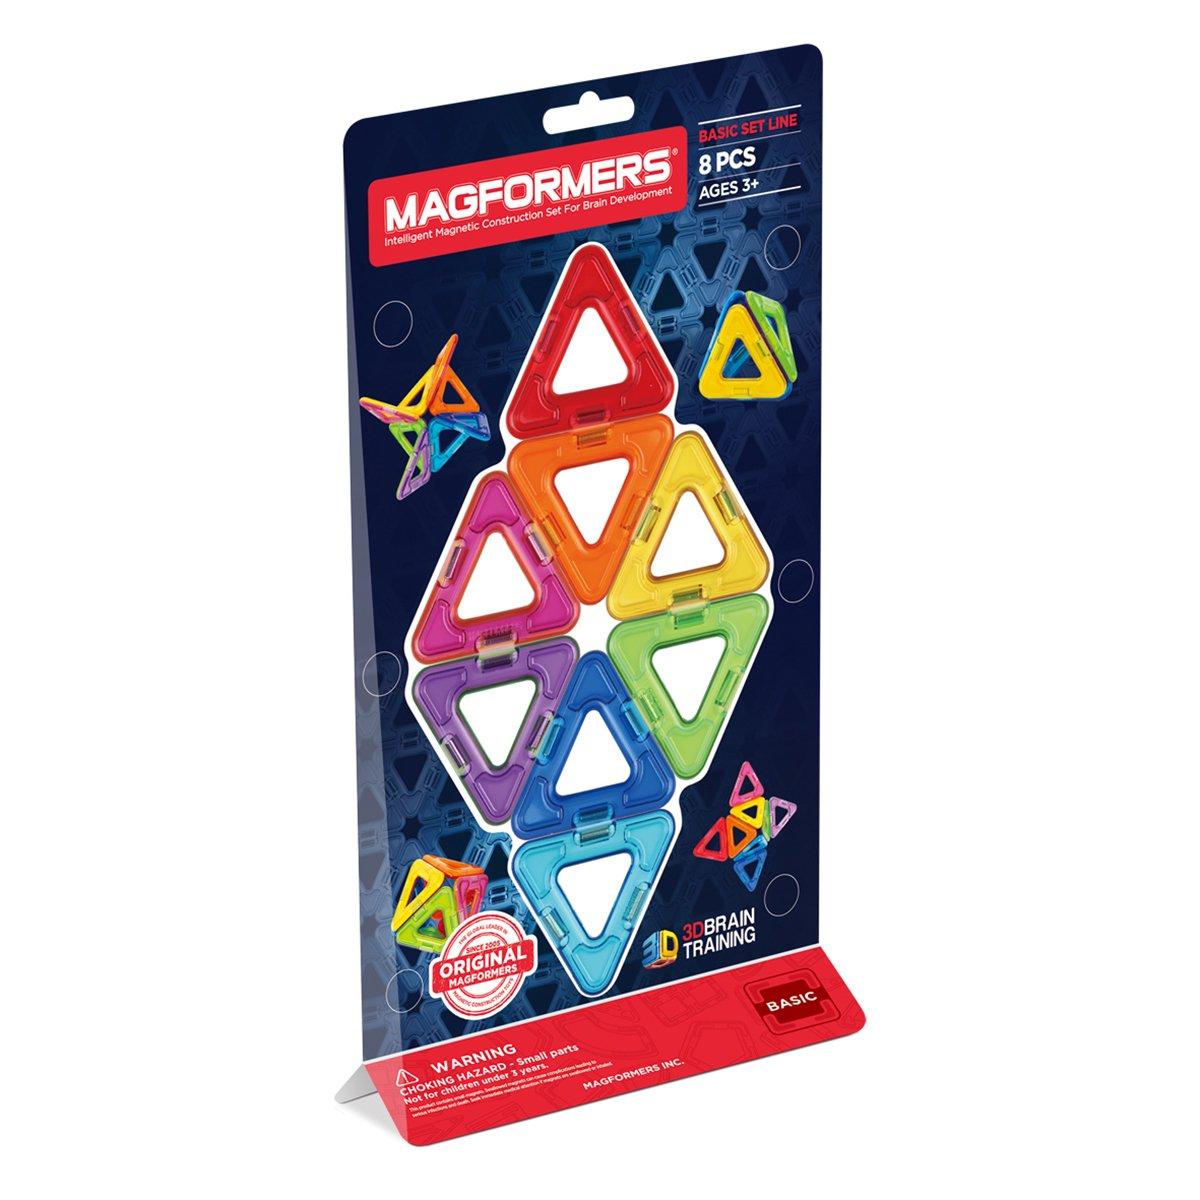 Magformers Triangles Set (8-Pieces) Magnetic    Building      Blocks, Educational  Magnetic    Tiles Kit , Magnetic    Construction  STEM Set